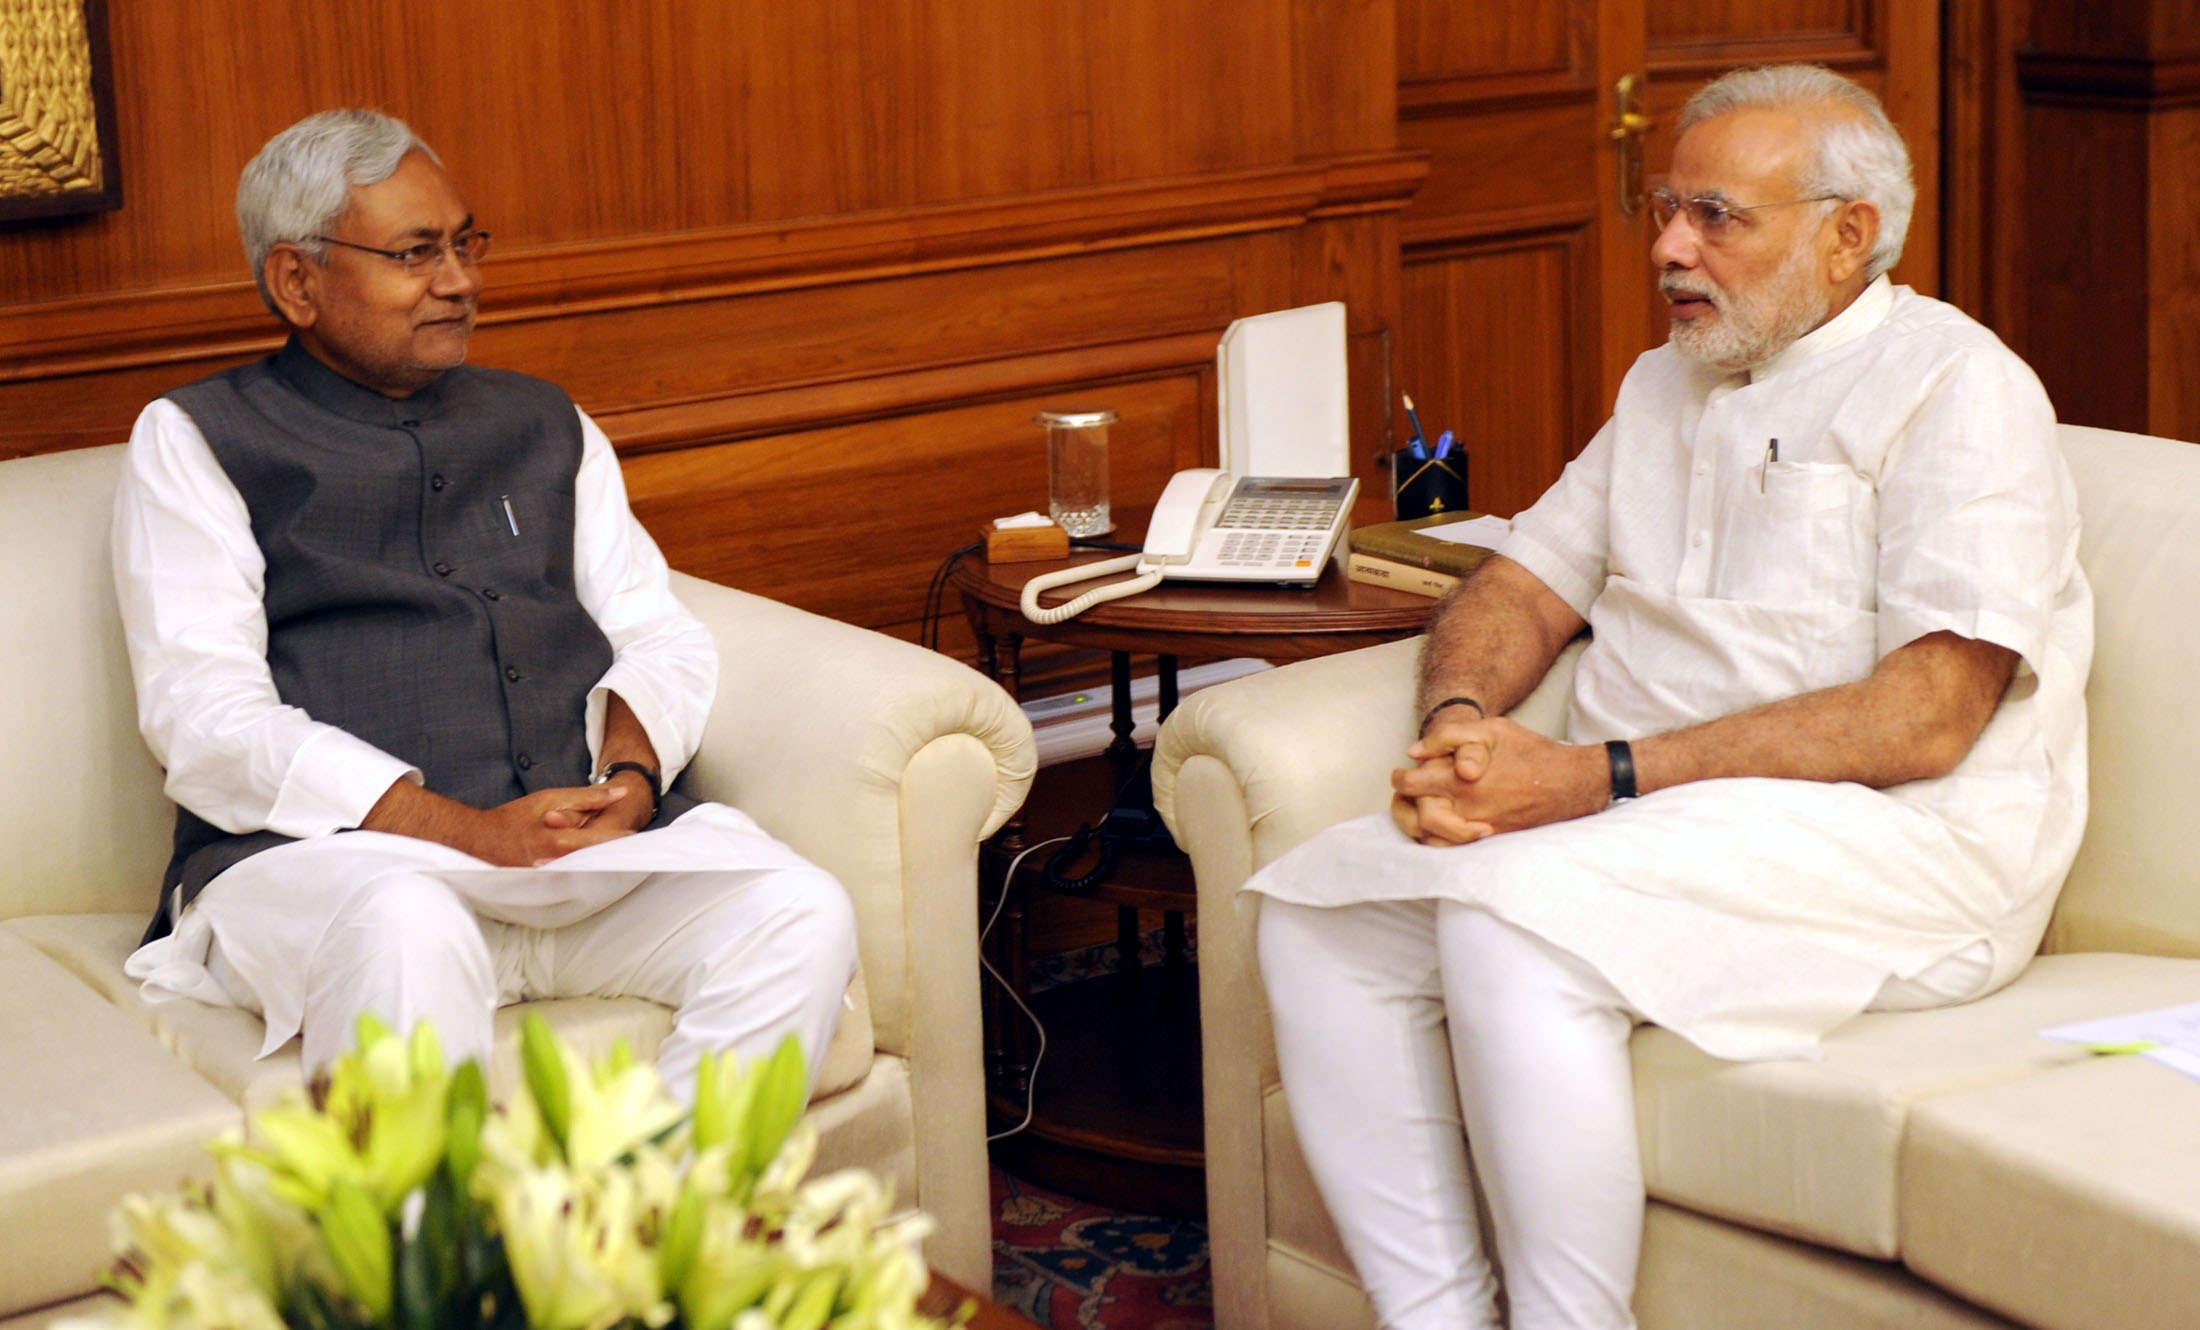 Bihar News: Finally, Chief Minister Nitish Kumar got time to meet Prime Minister Narendra Modi on the caste census